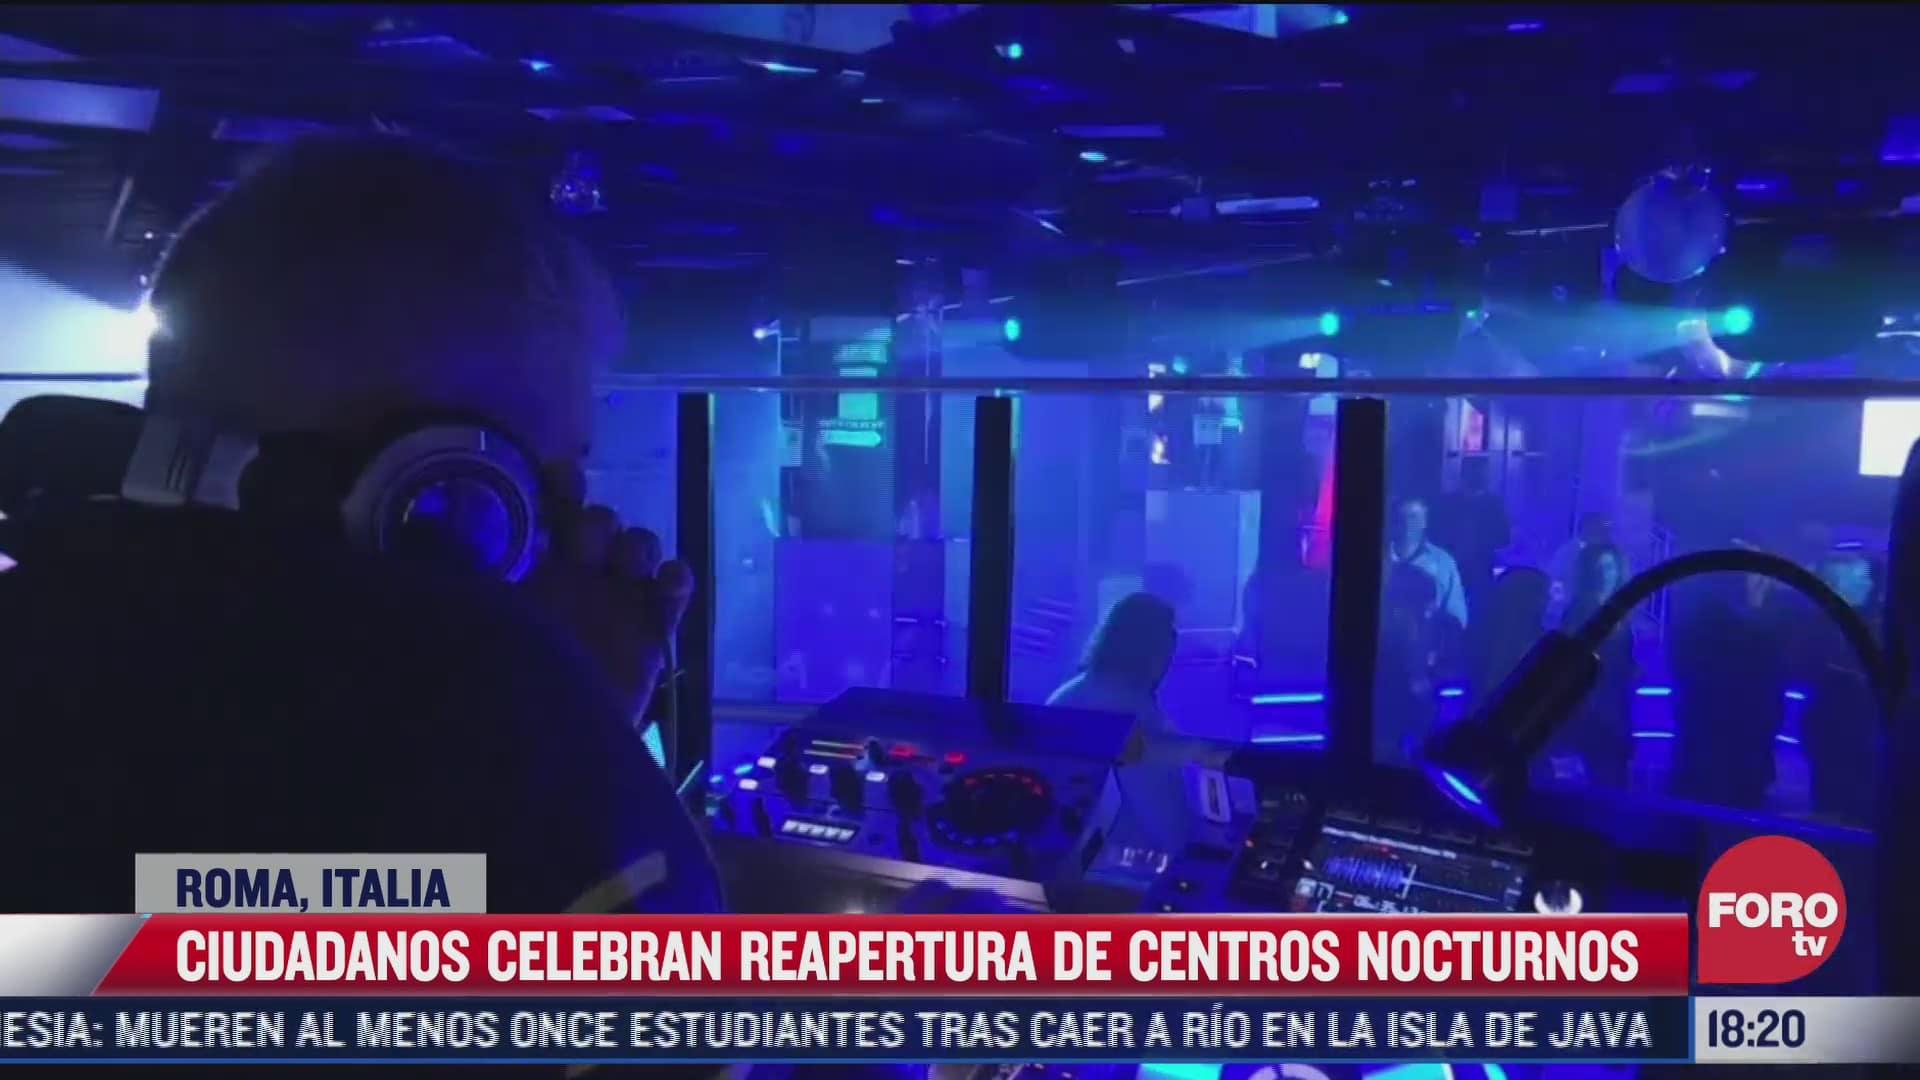 celebran reapertura de centros nocturnos en roma italia